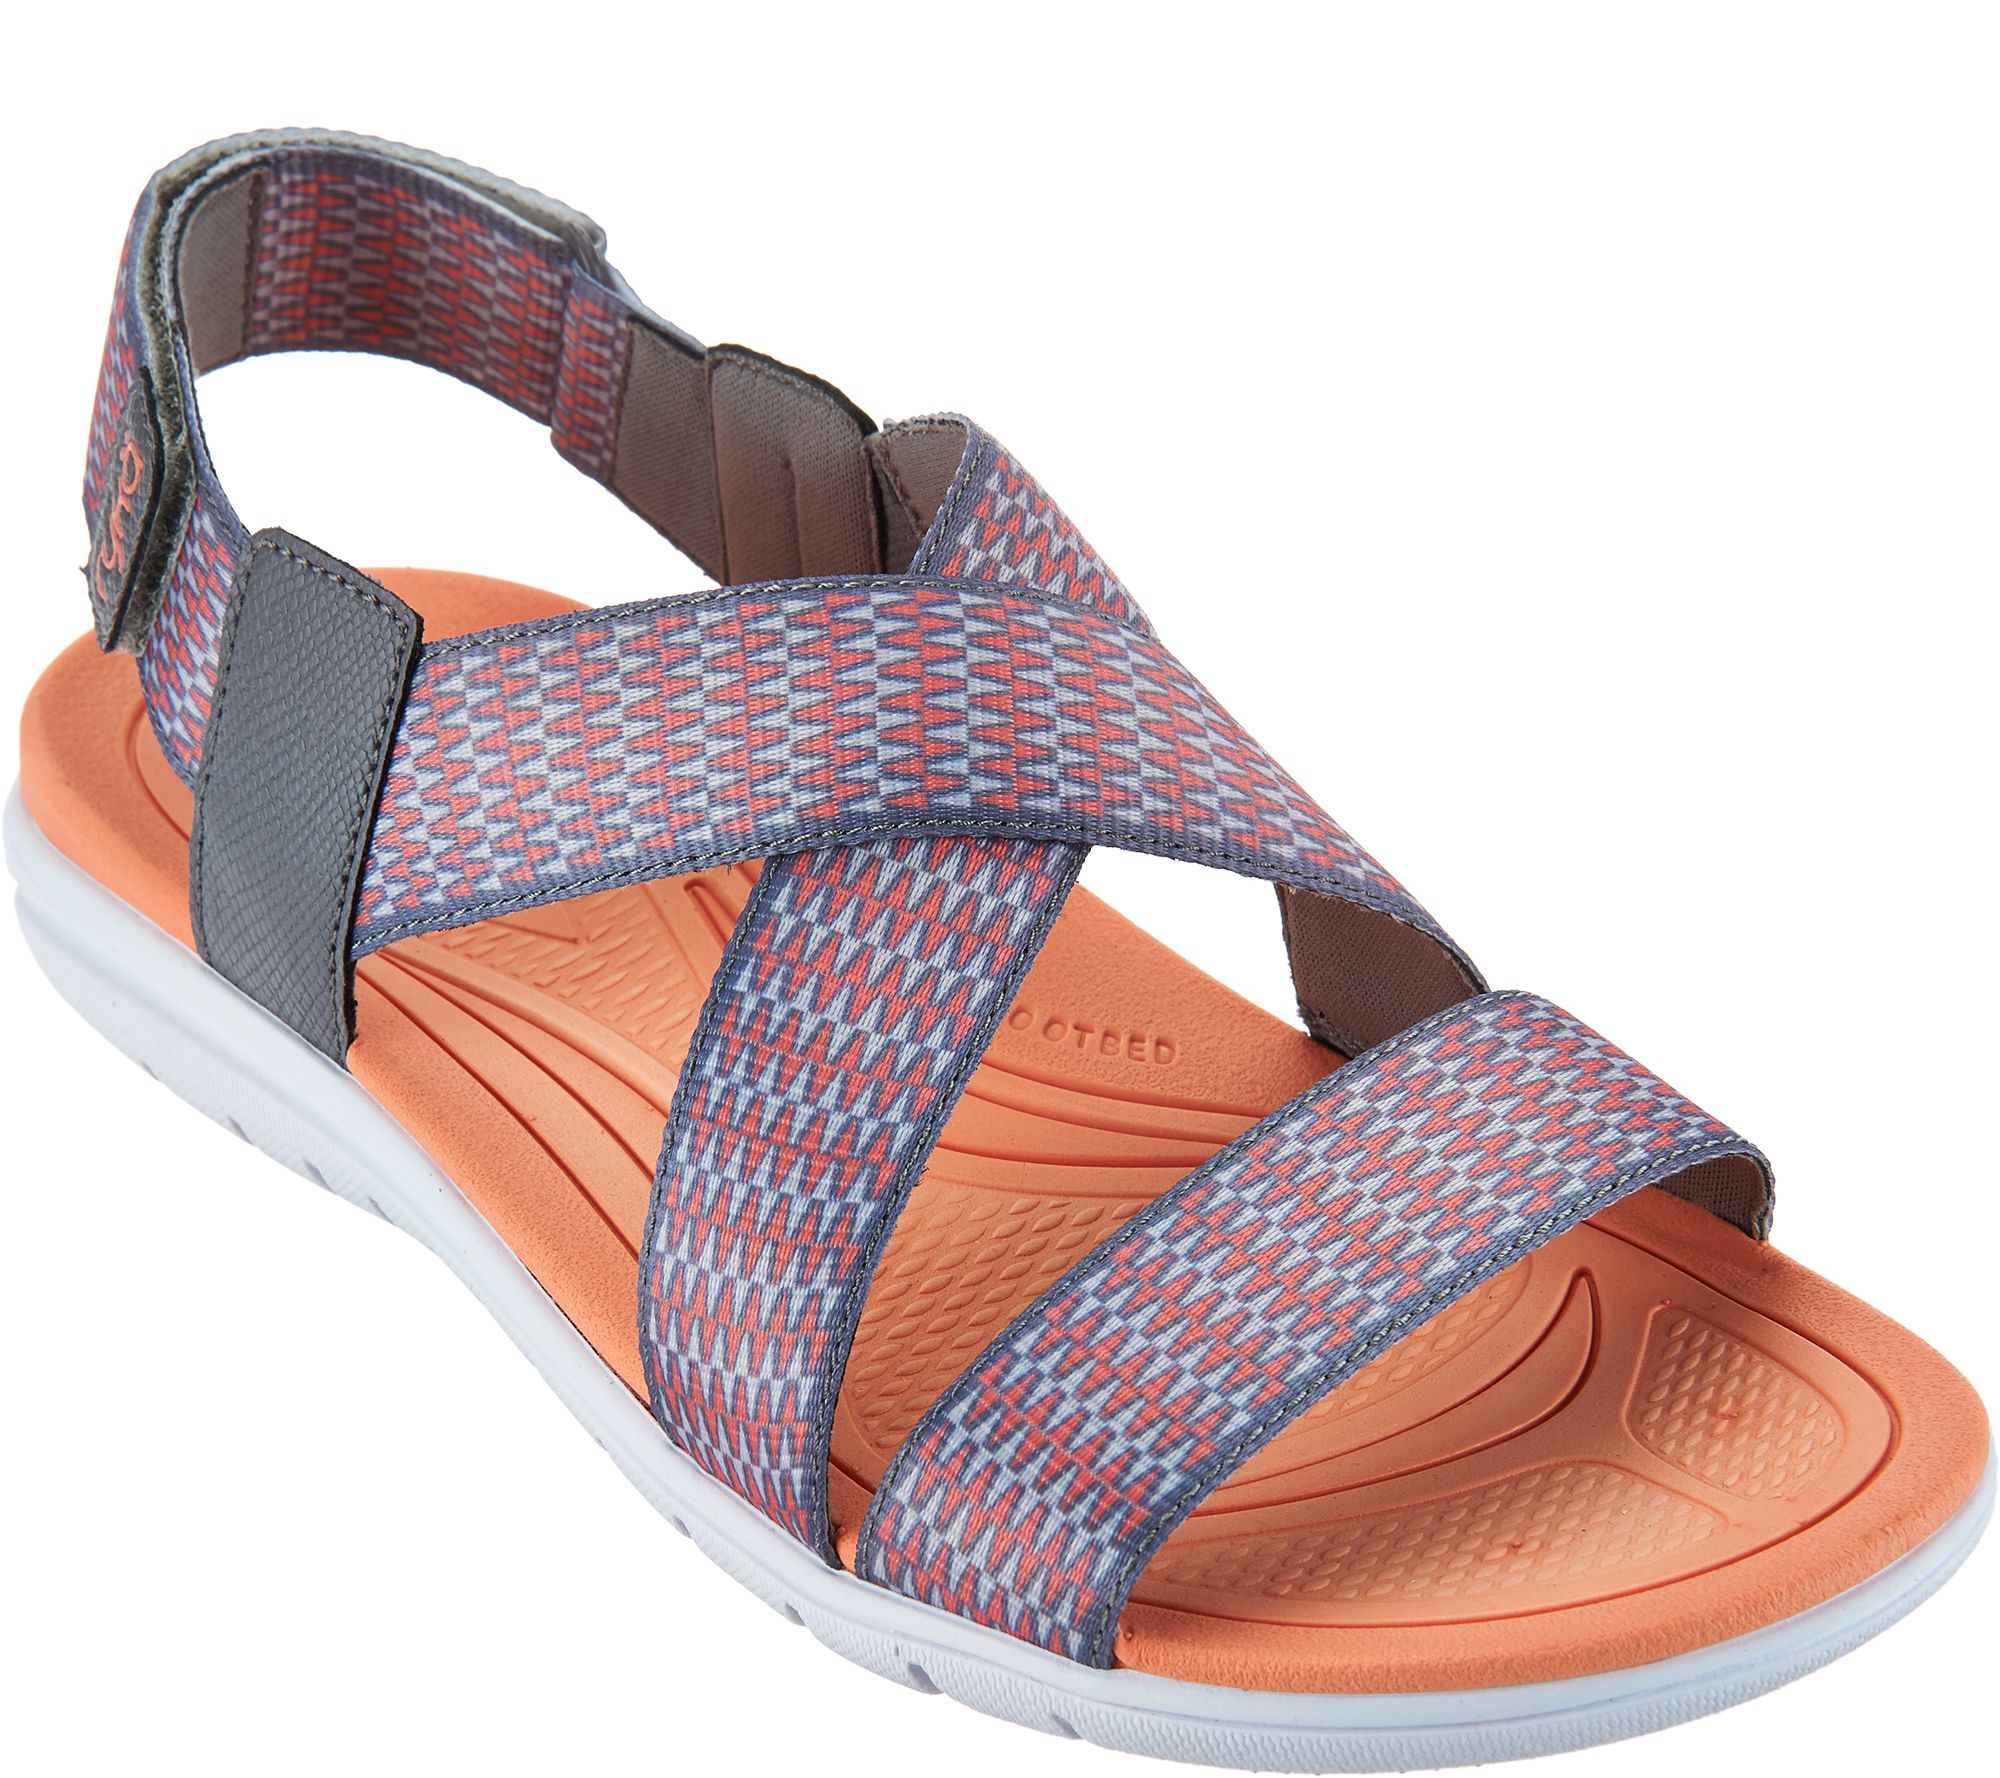 Ryka adjustable sport sandals with css tech belmar a289127